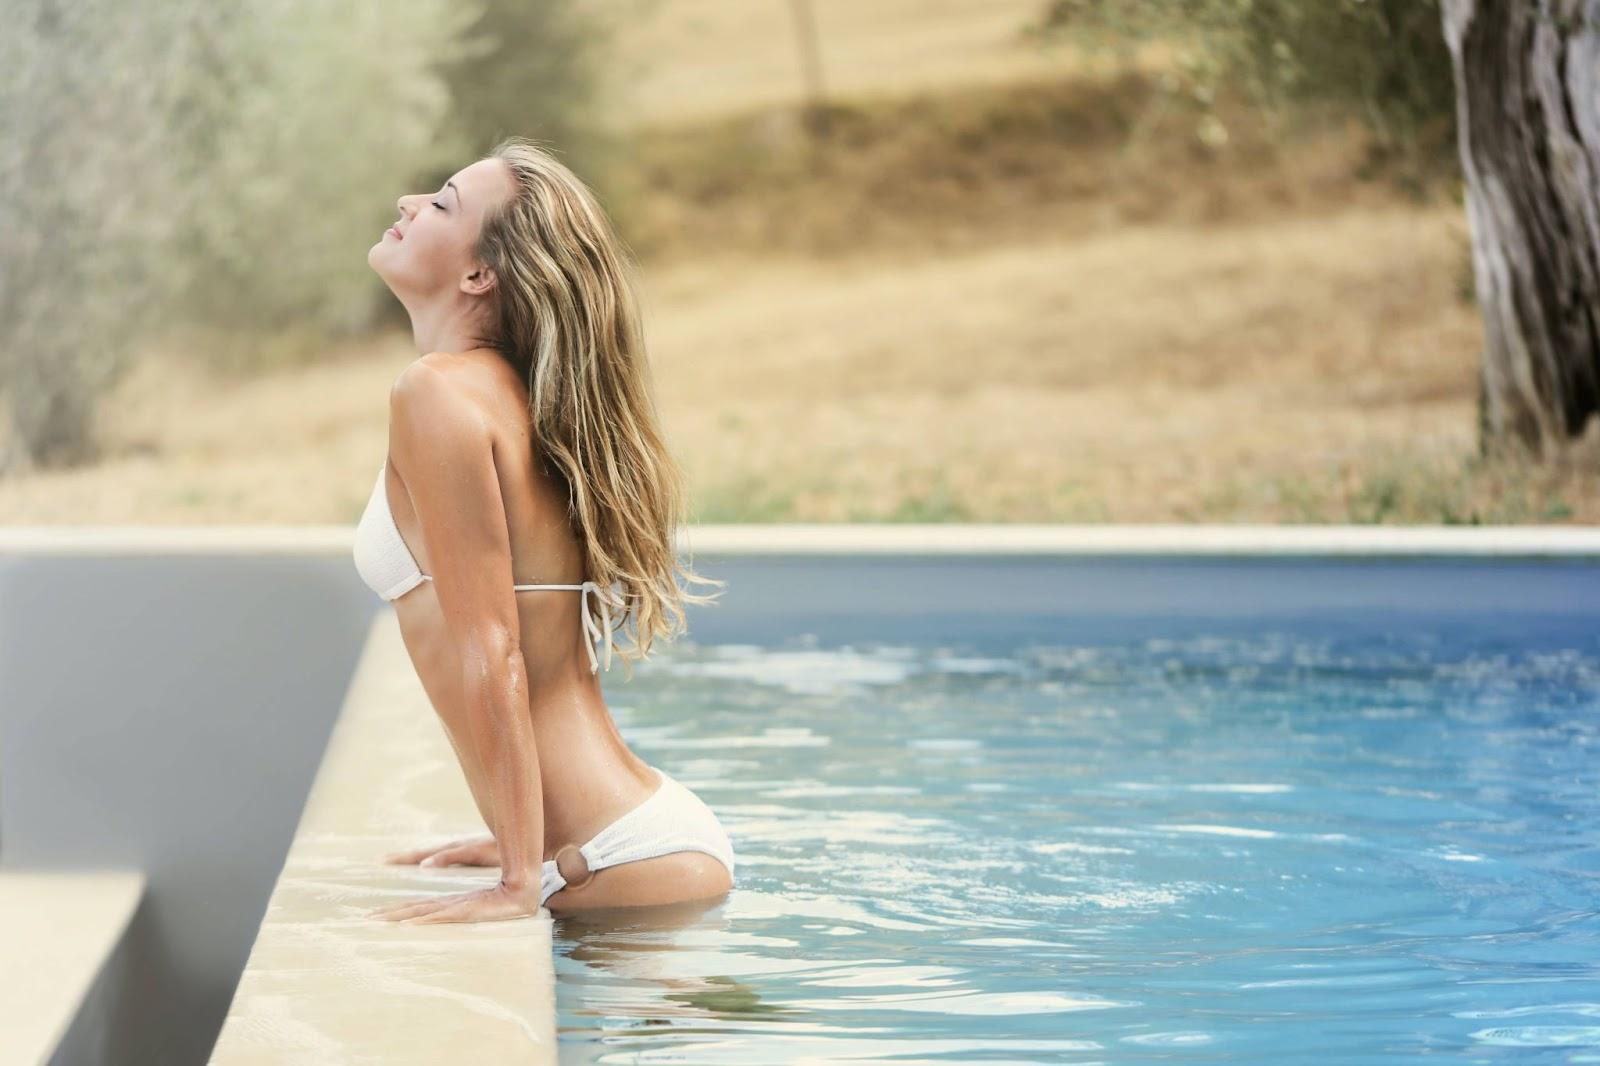 donna-bordo-piscina-costume-bianco